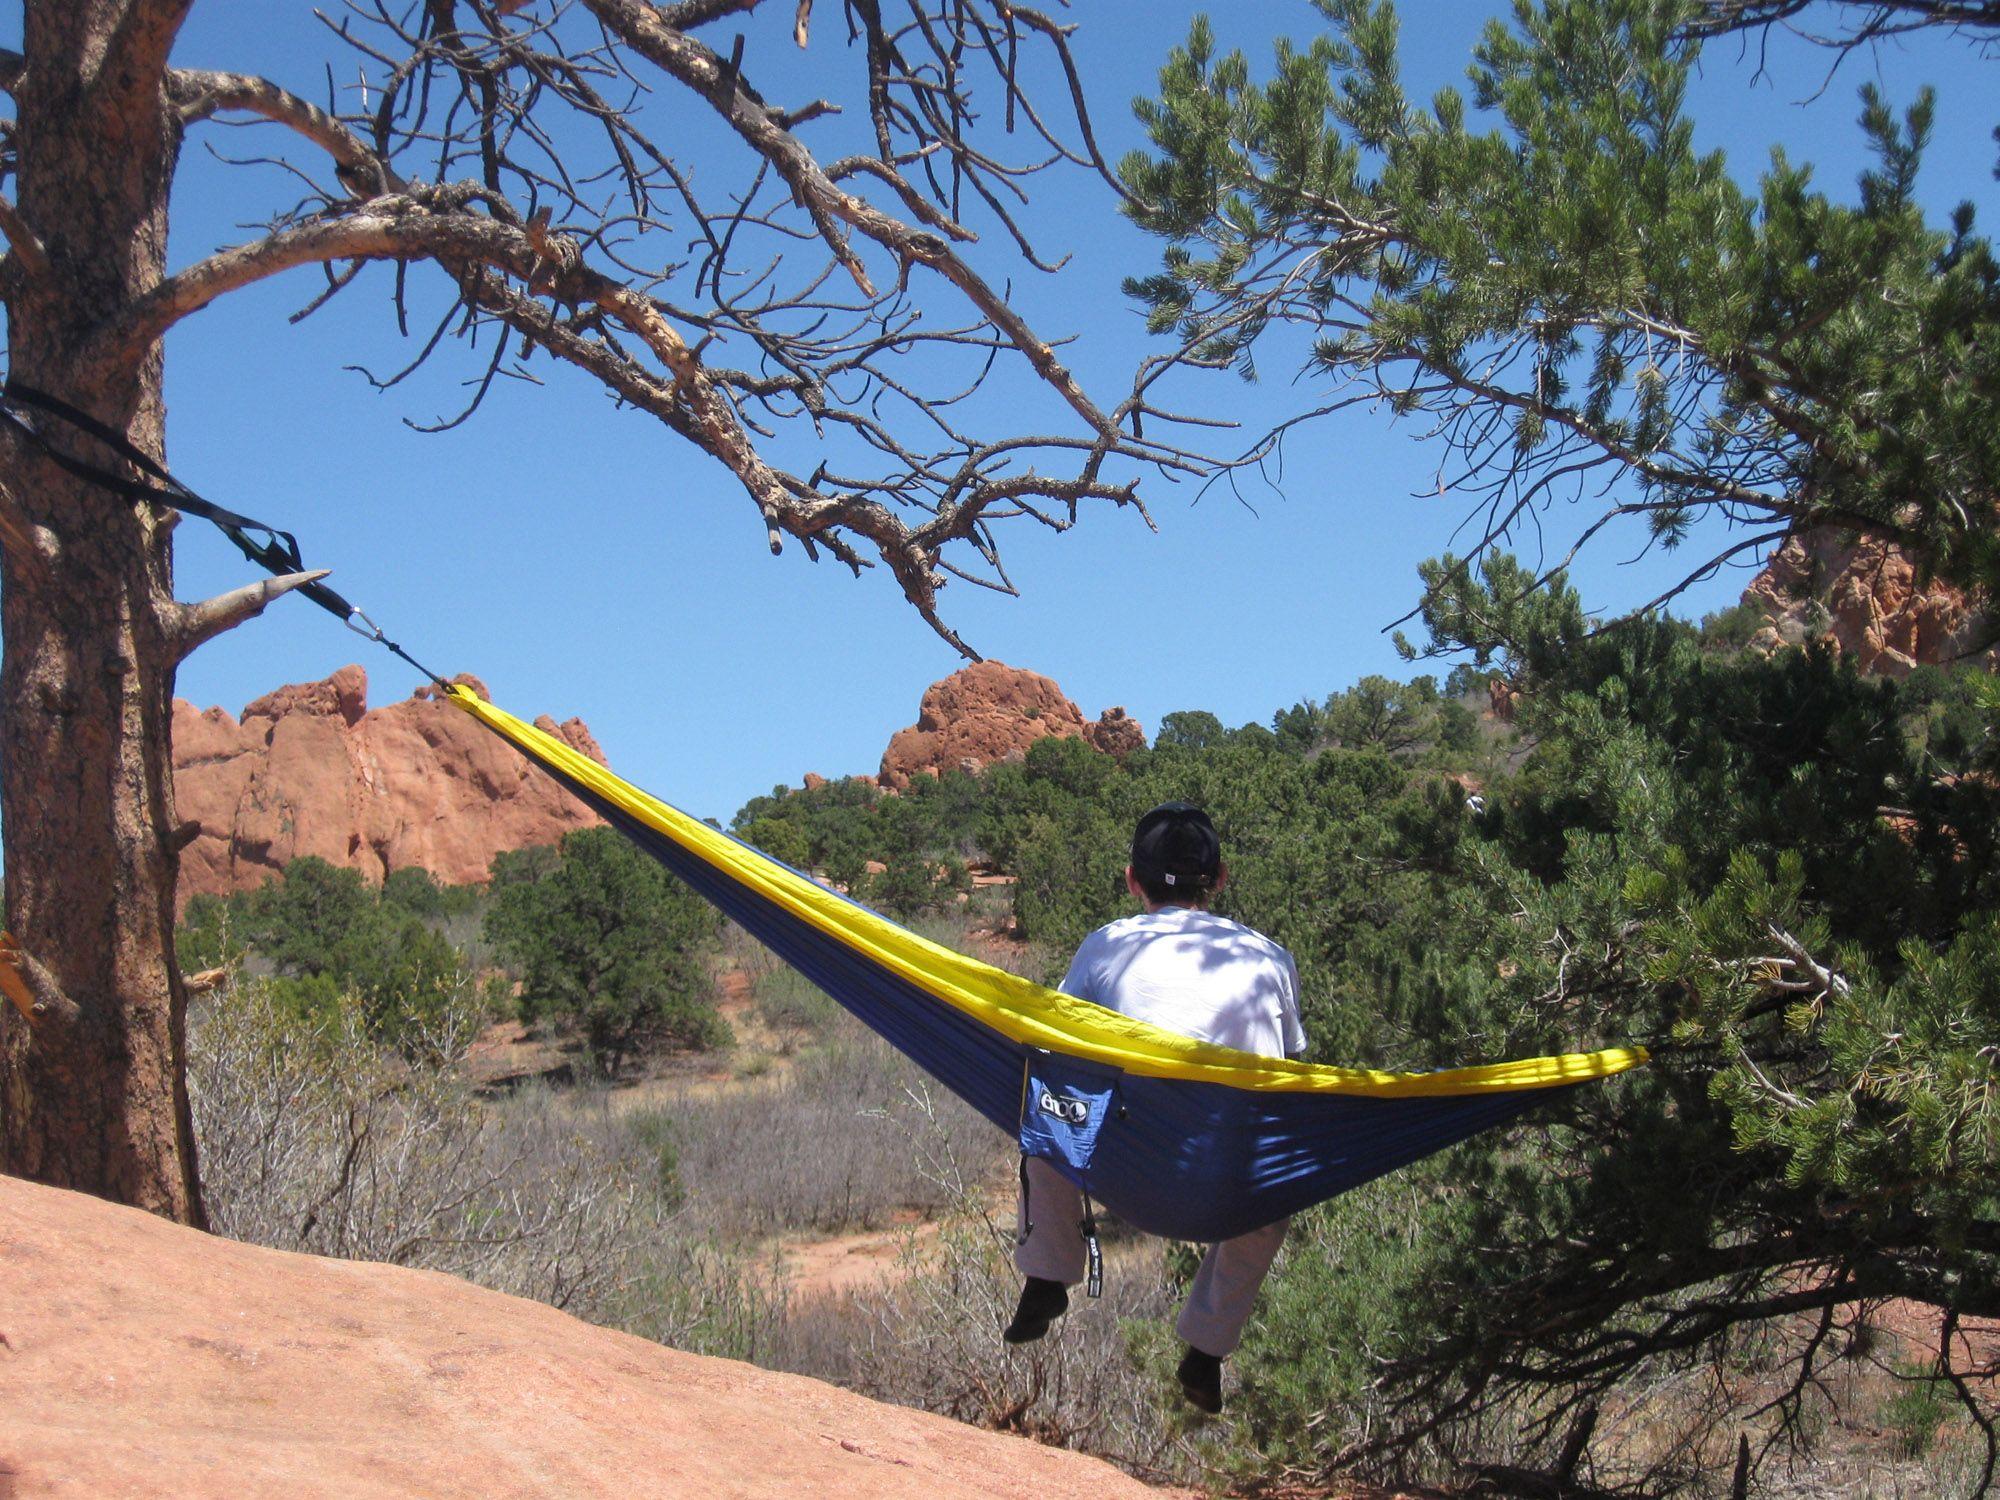 Sean echeverria photo contest pinterest eno hammock and photos